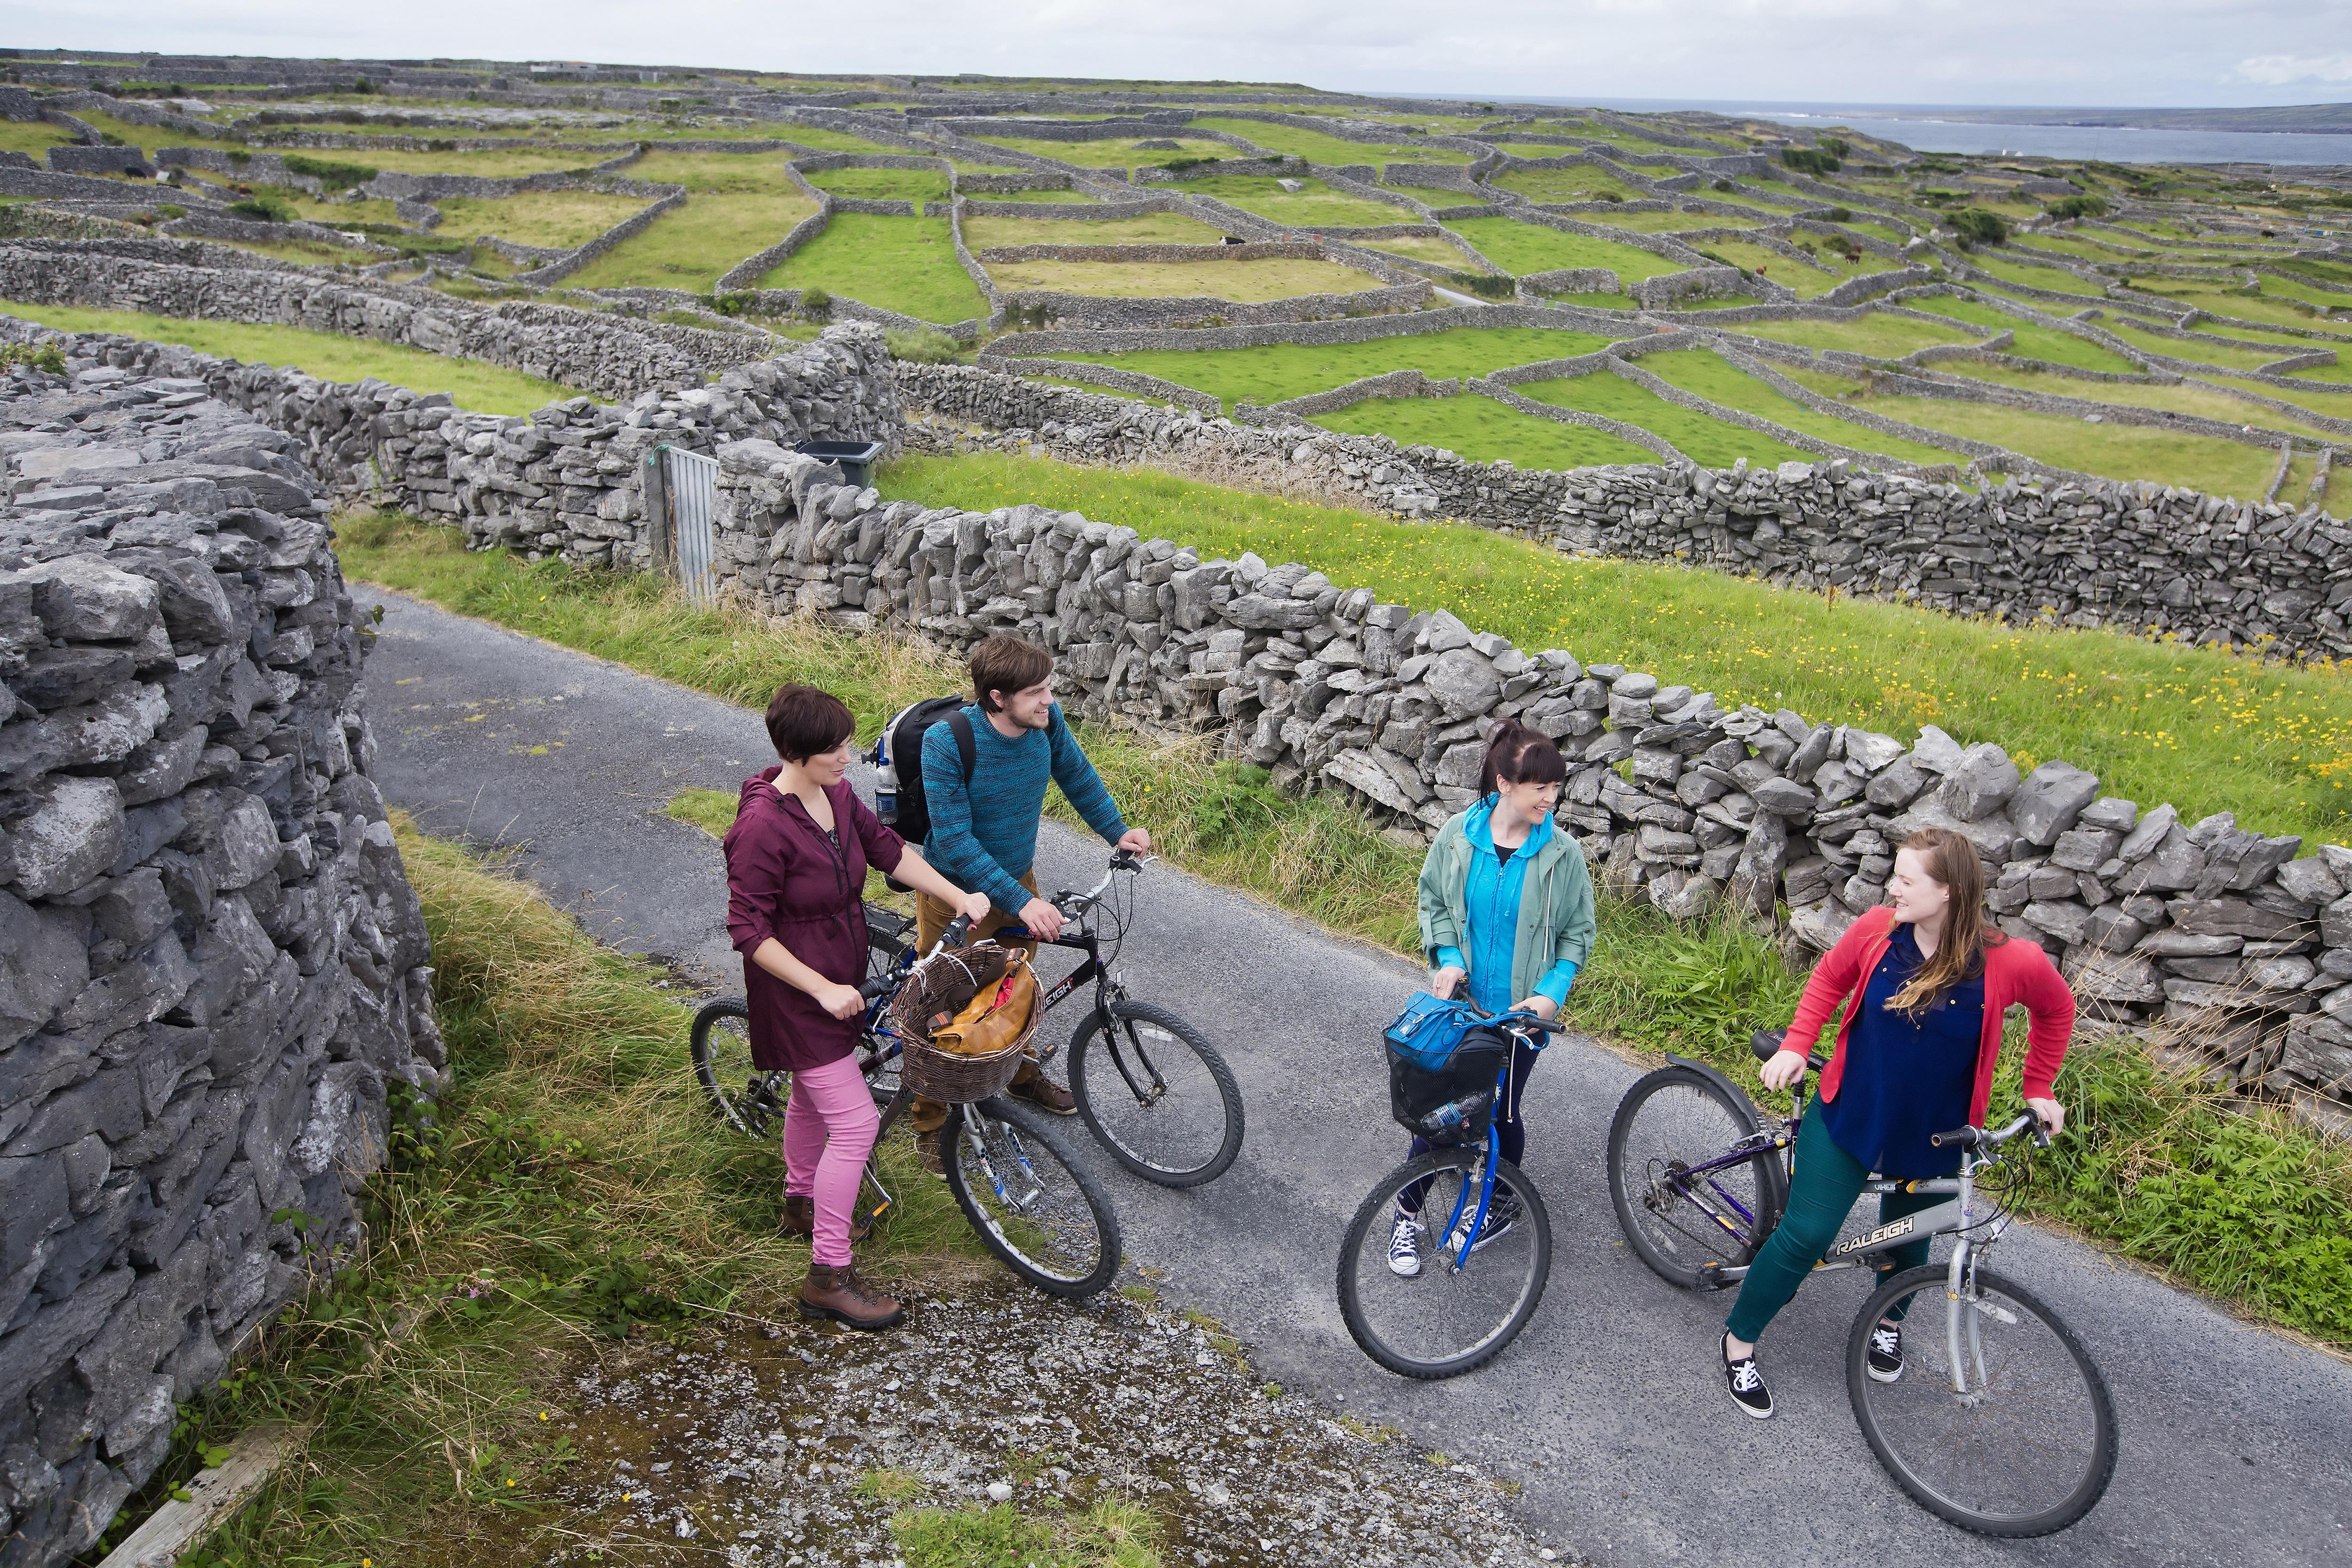 stone-walls-biking-inis-oirr